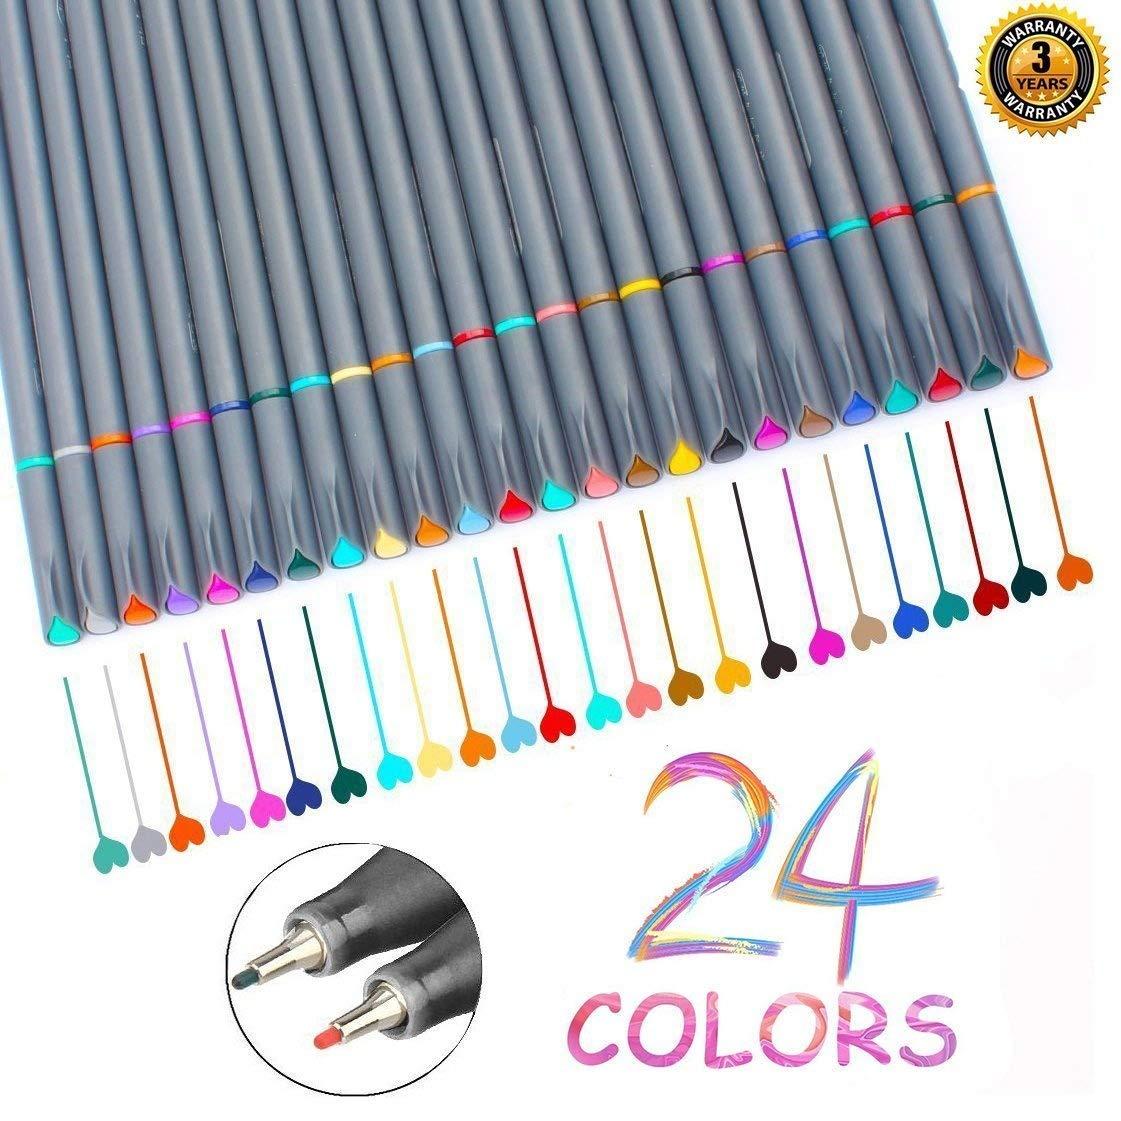 Fineliner Pens, Vonart Fineliner Color Pens 24 Art Pens for Drawing Fine Tip Colored Writing Pens Fine Line Point Marker Pens for Bullet Journal Planner Note Calendar Coloring Art Projects